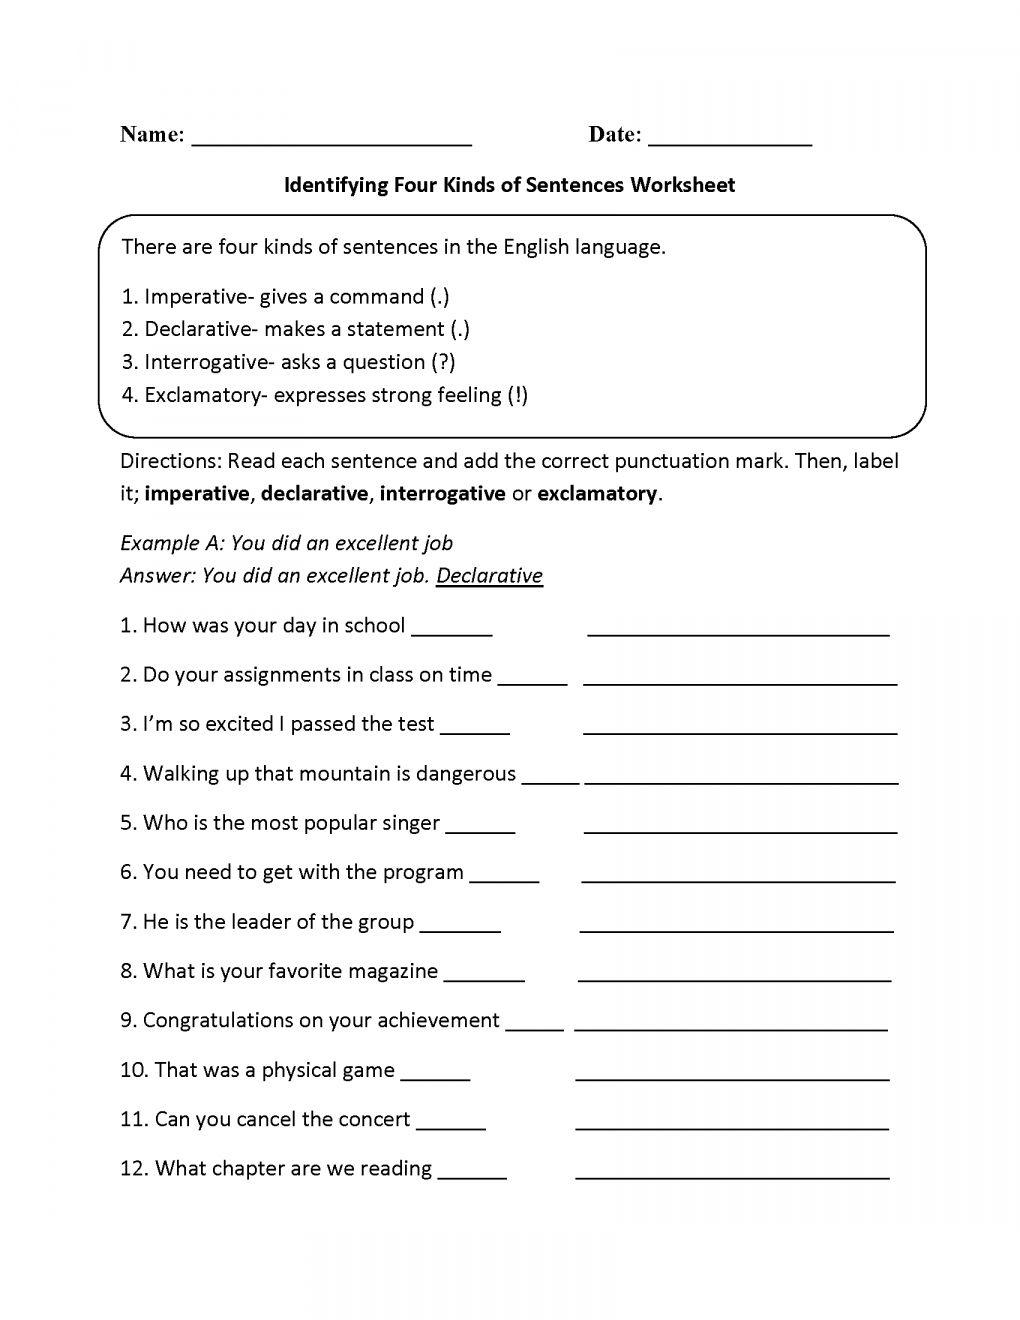 10 4 Types Of Sentences Worksheet Grade 2 Types Of Sentences Worksheet Complex Sentences Worksheets Types Of Sentences